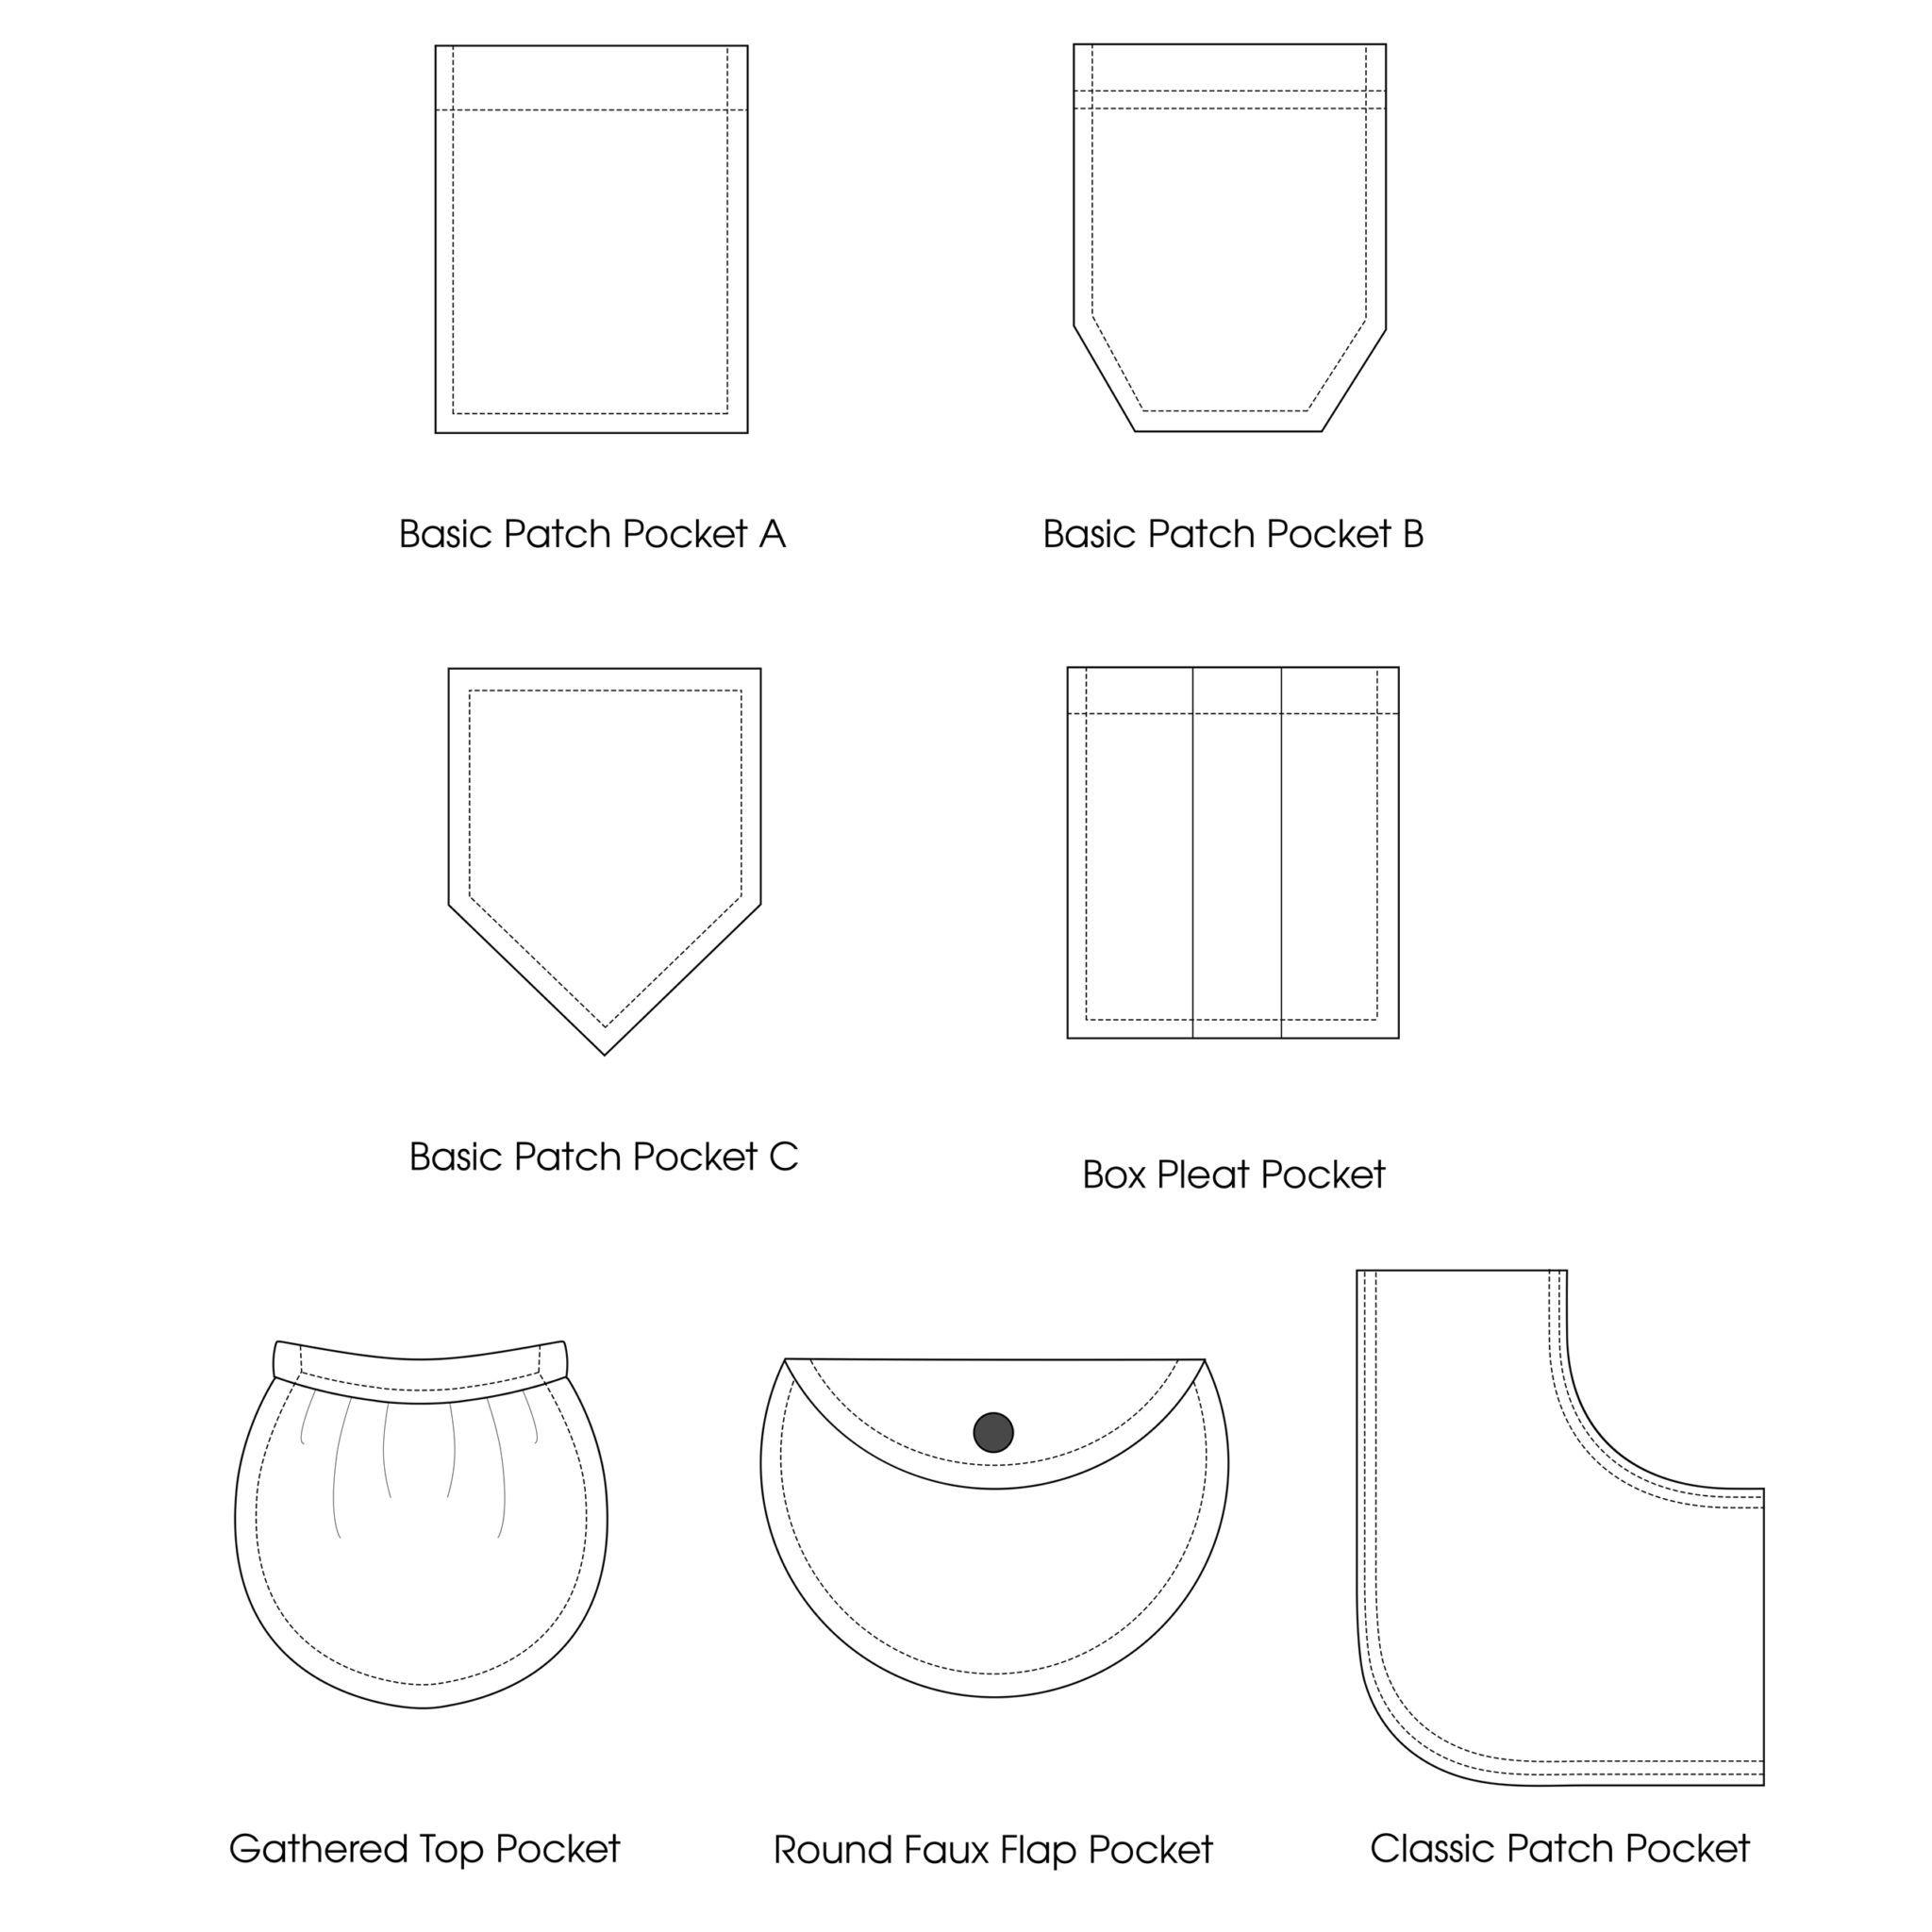 Ultimate Patch Pocket Pattern - Add pockets to any garment ...